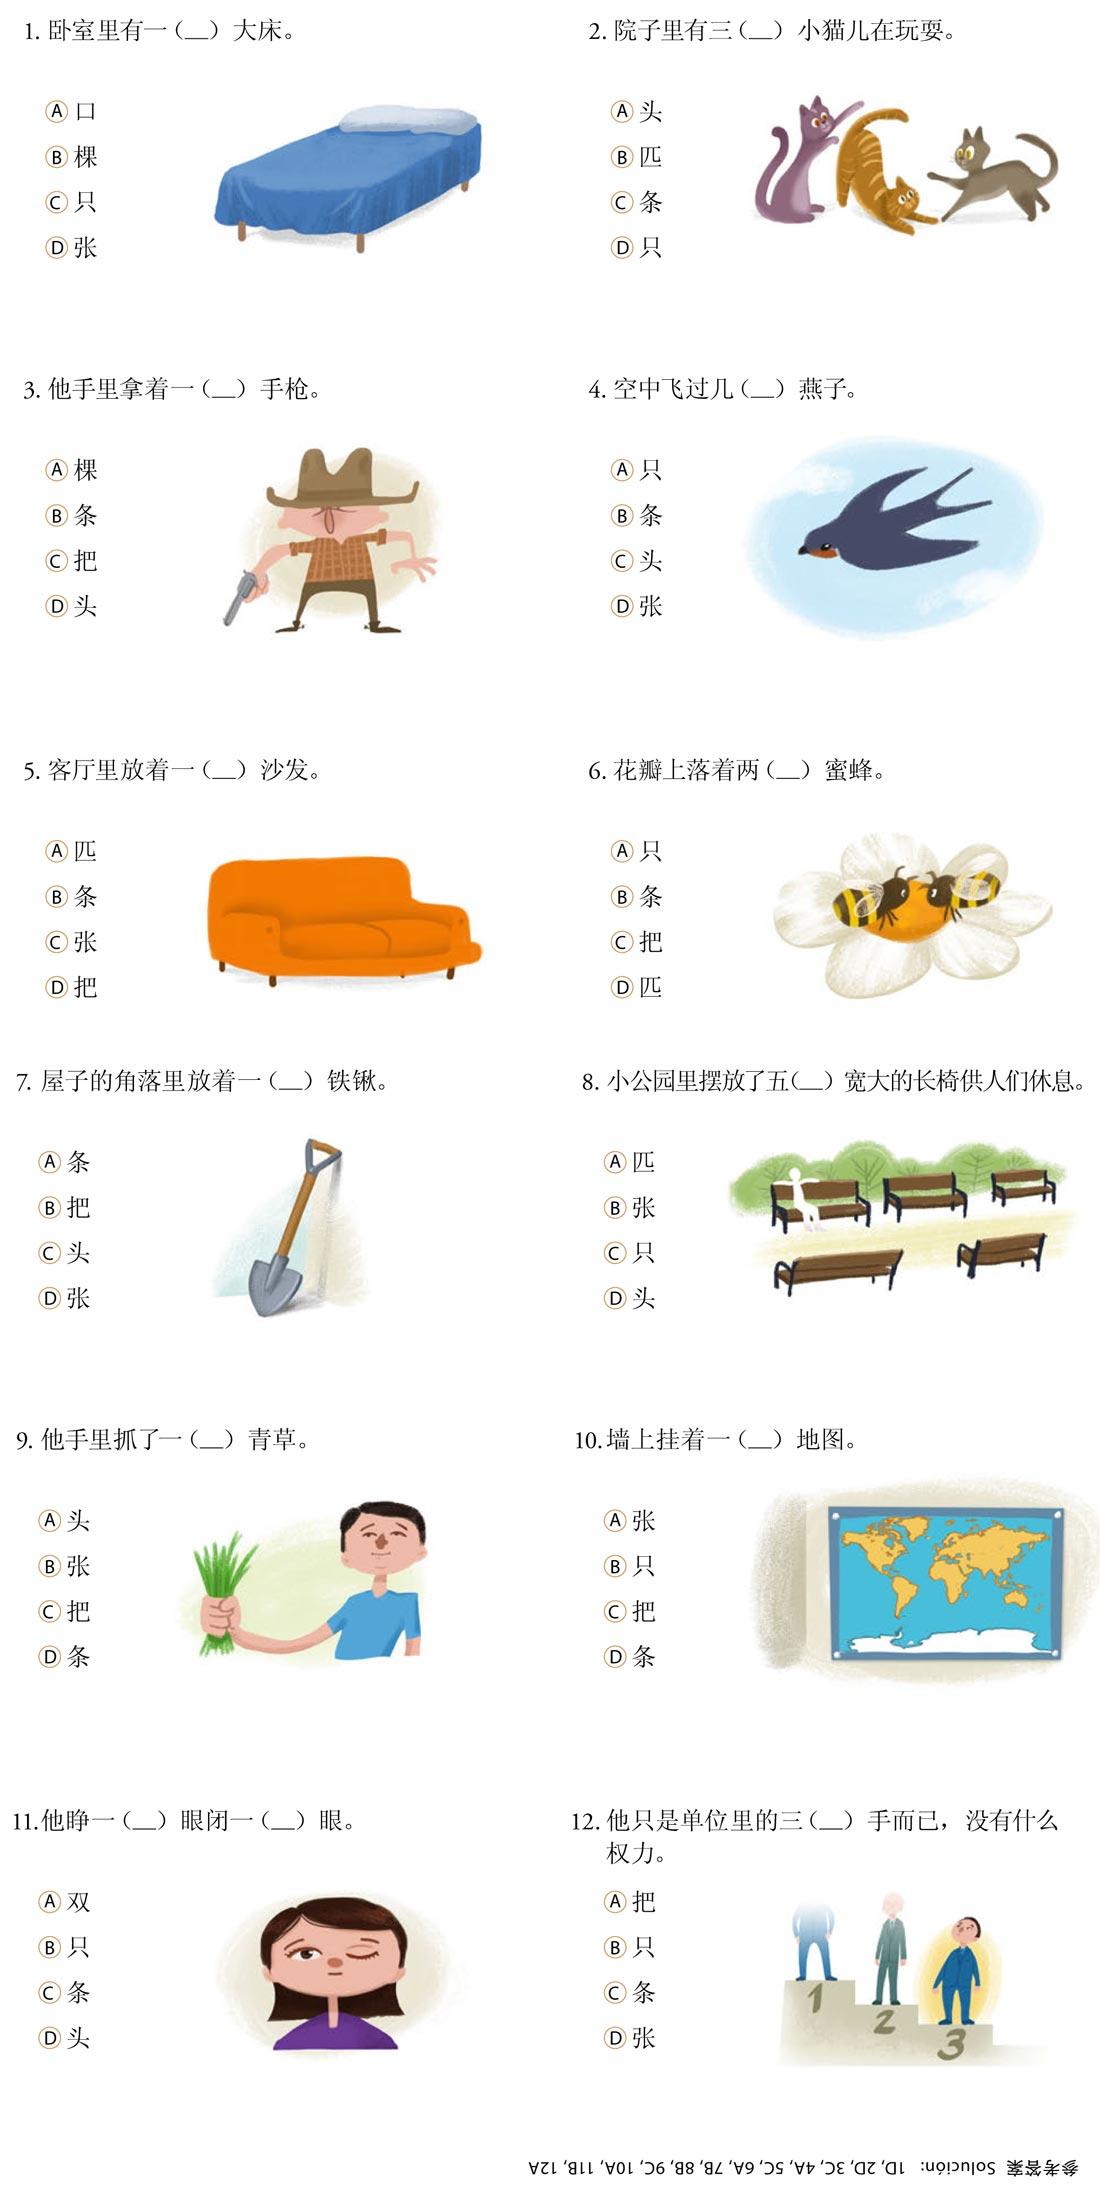 clasificadores chinos con motivación cognitiva